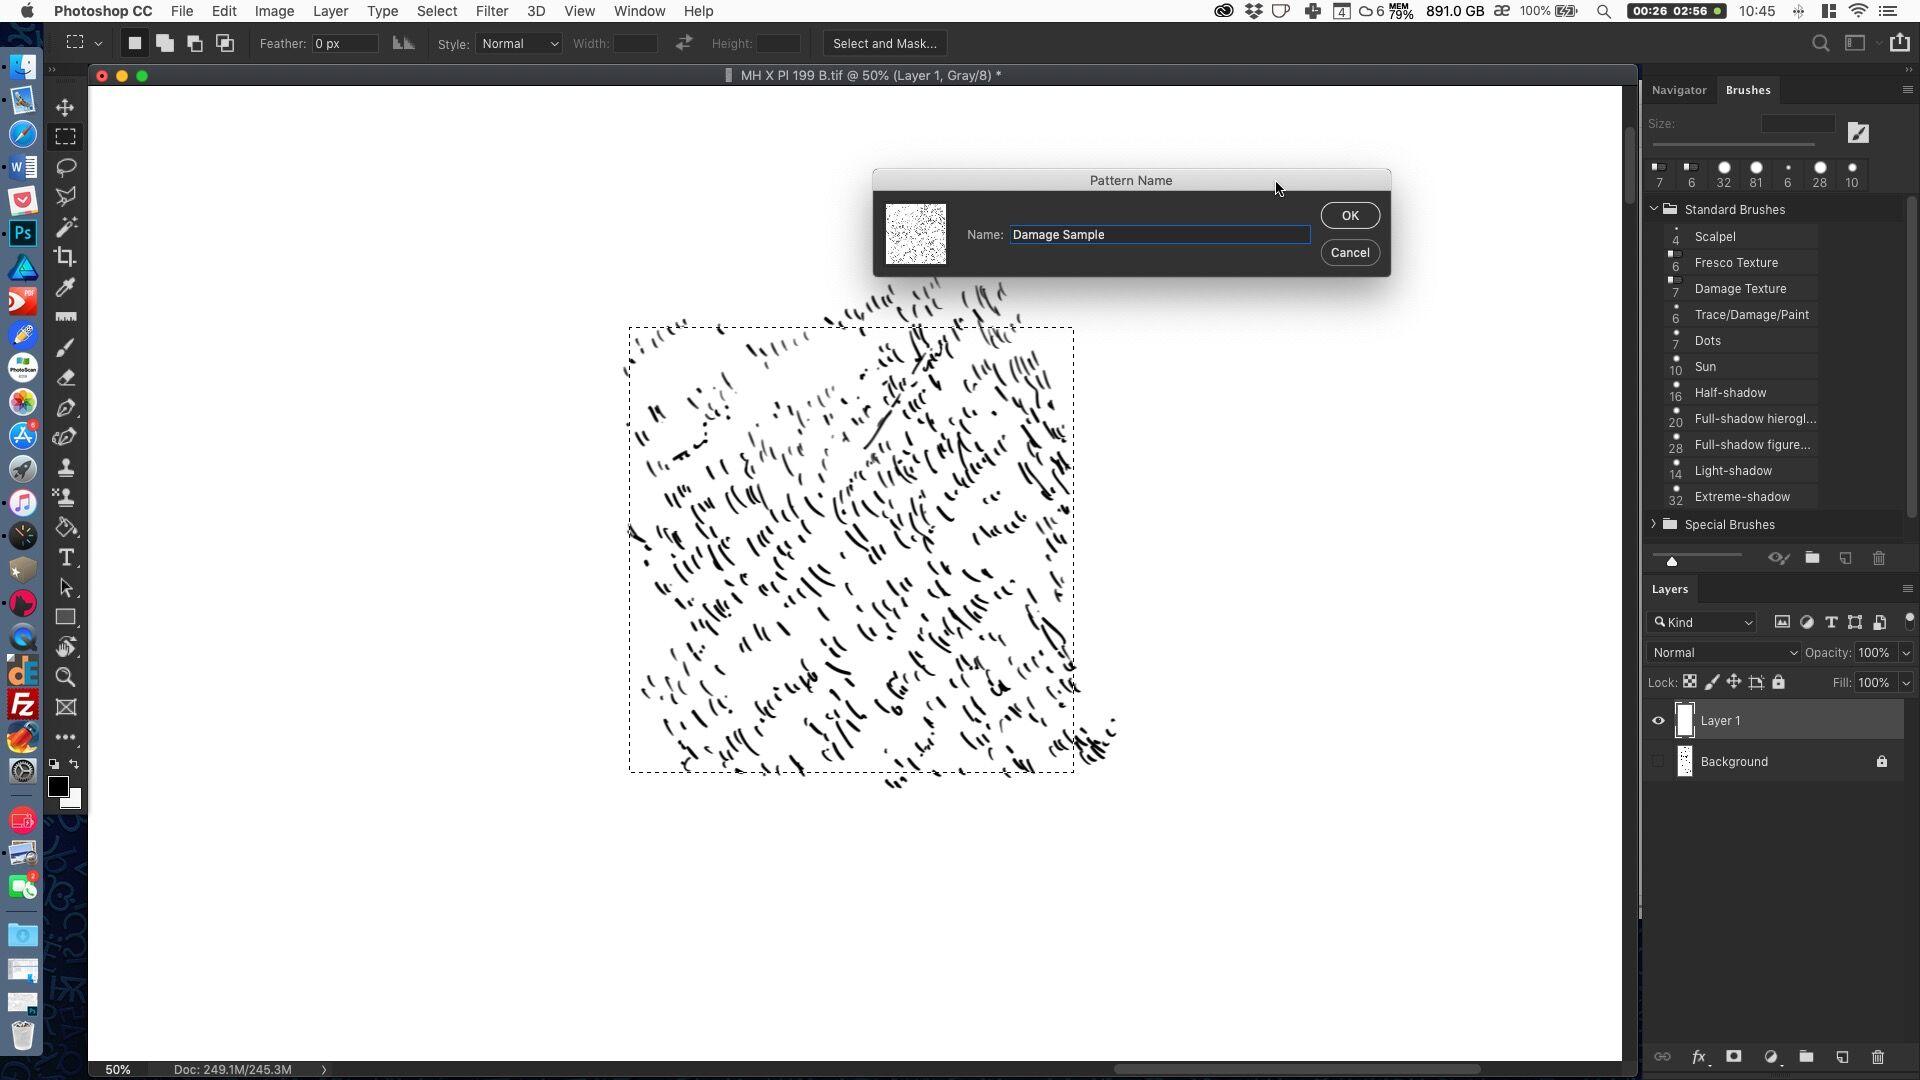 Creating a digital damage pattern